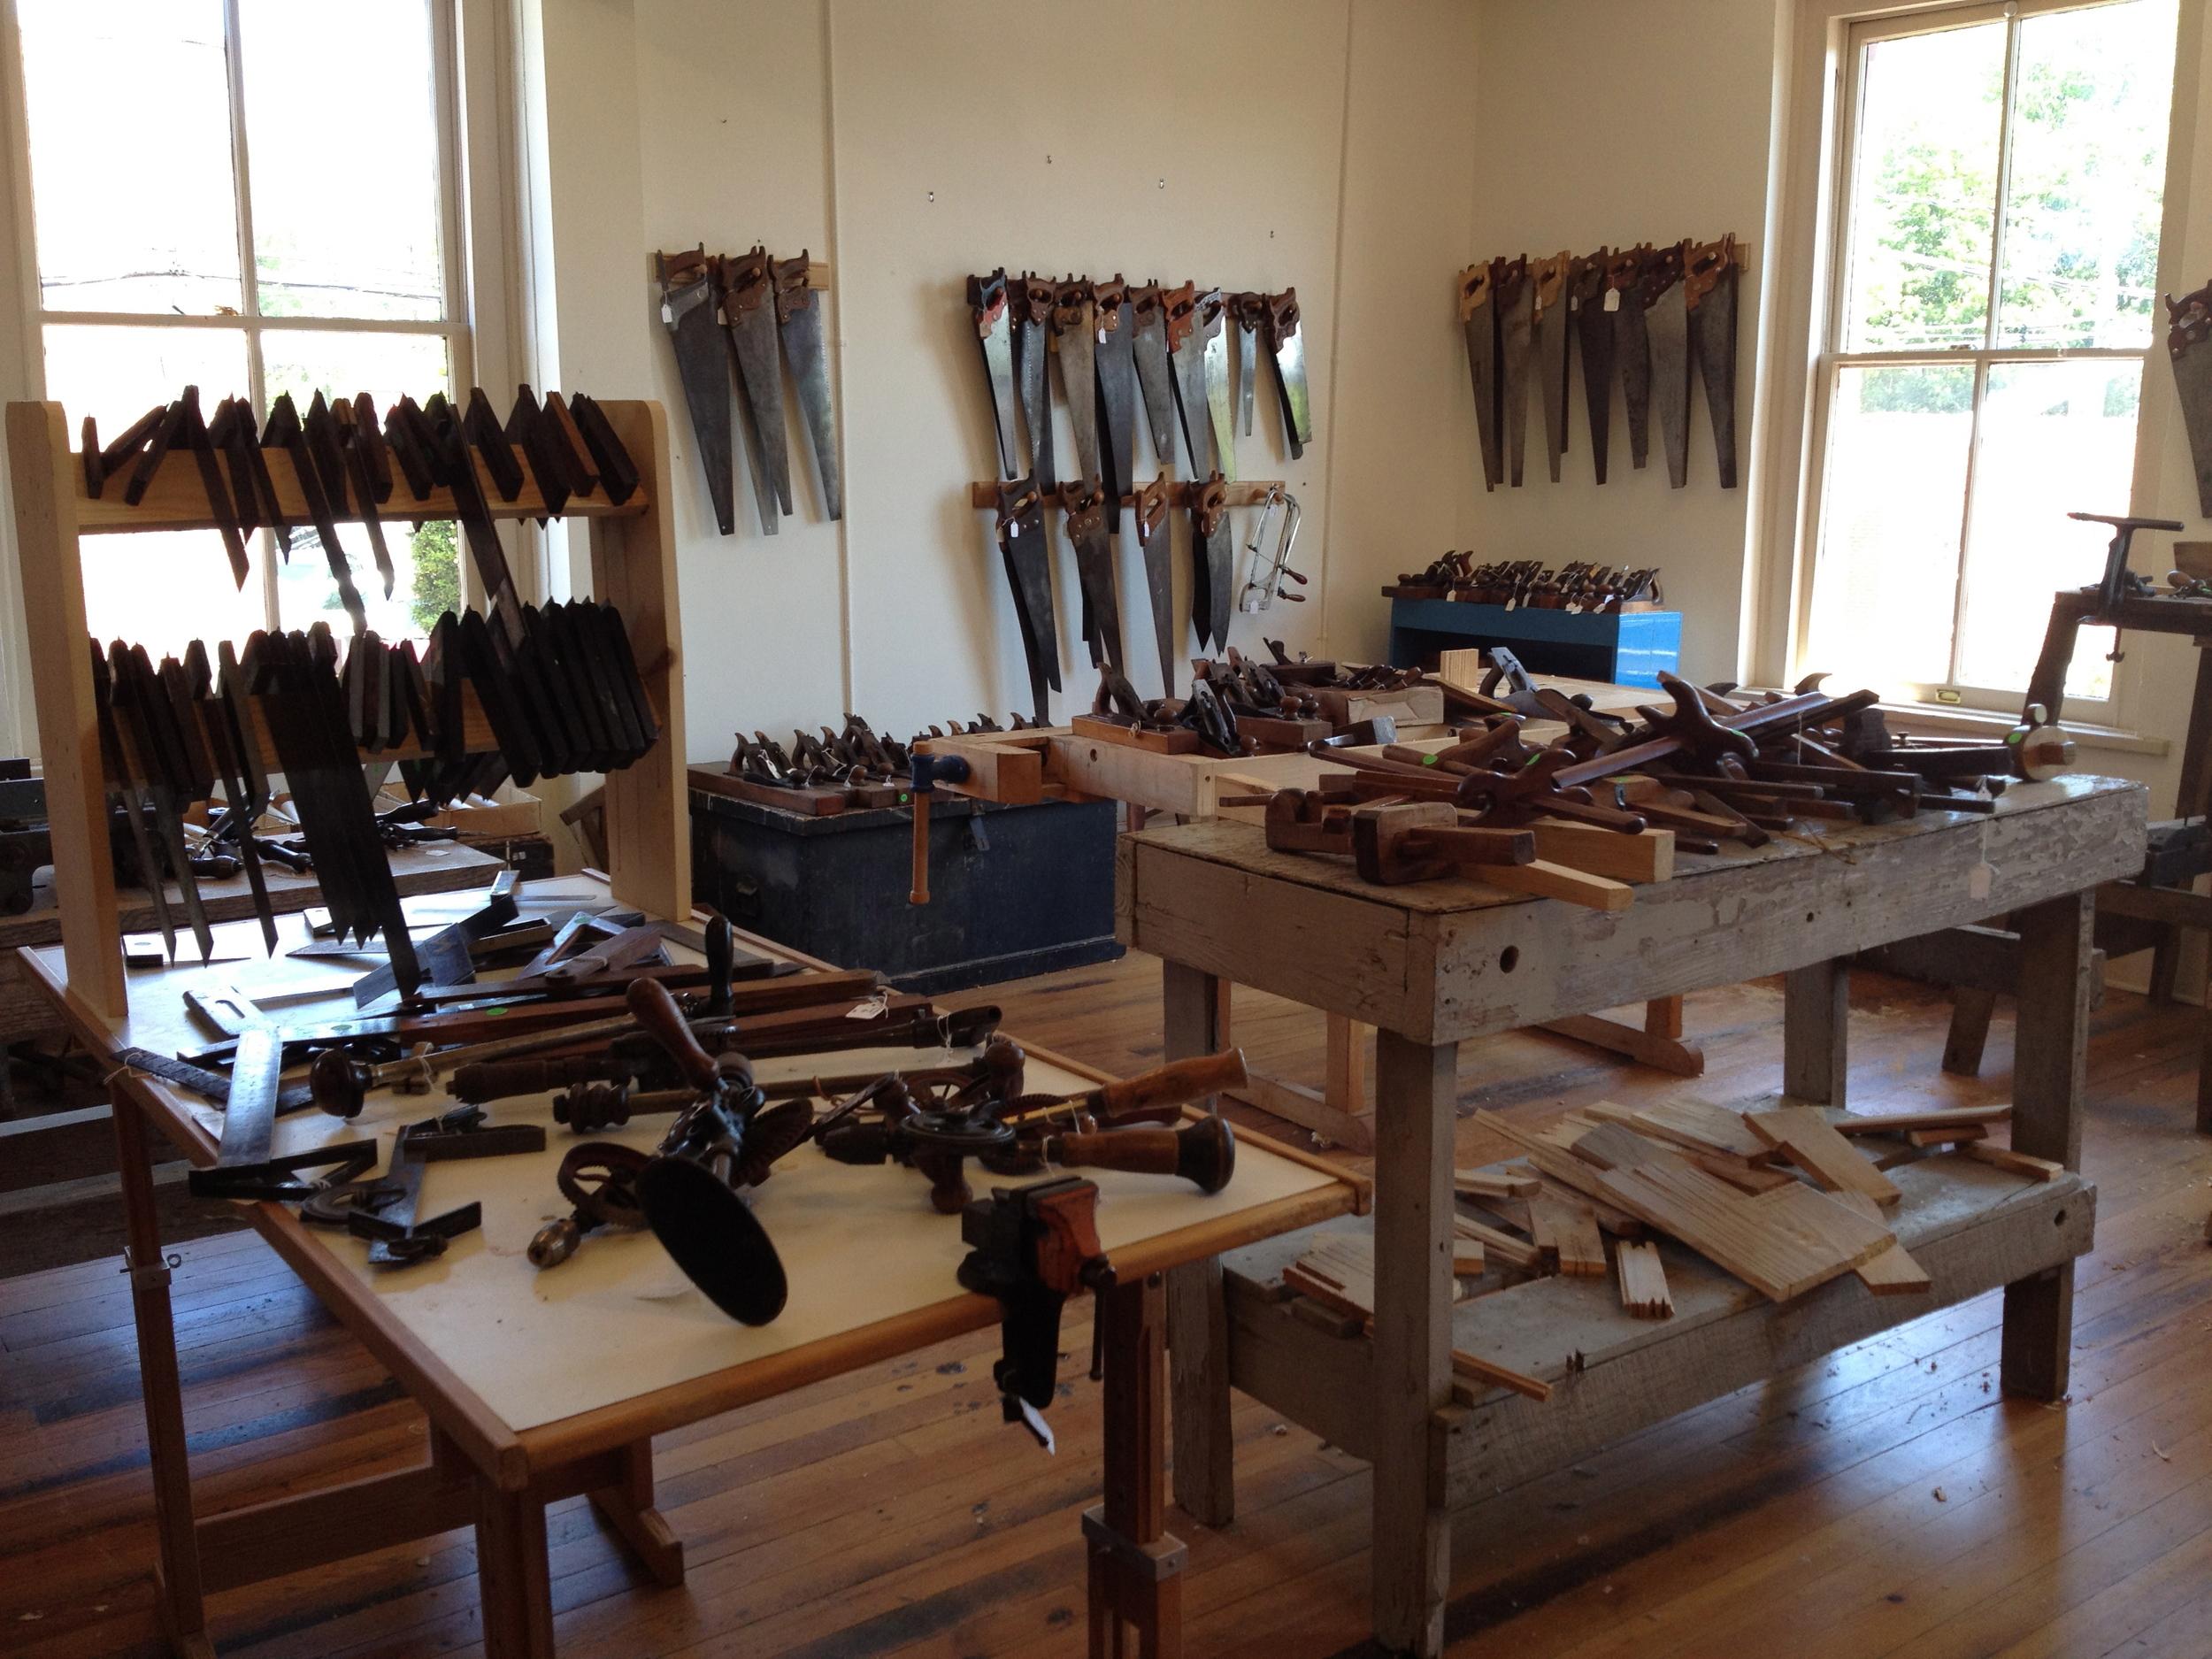 Ed's tool store